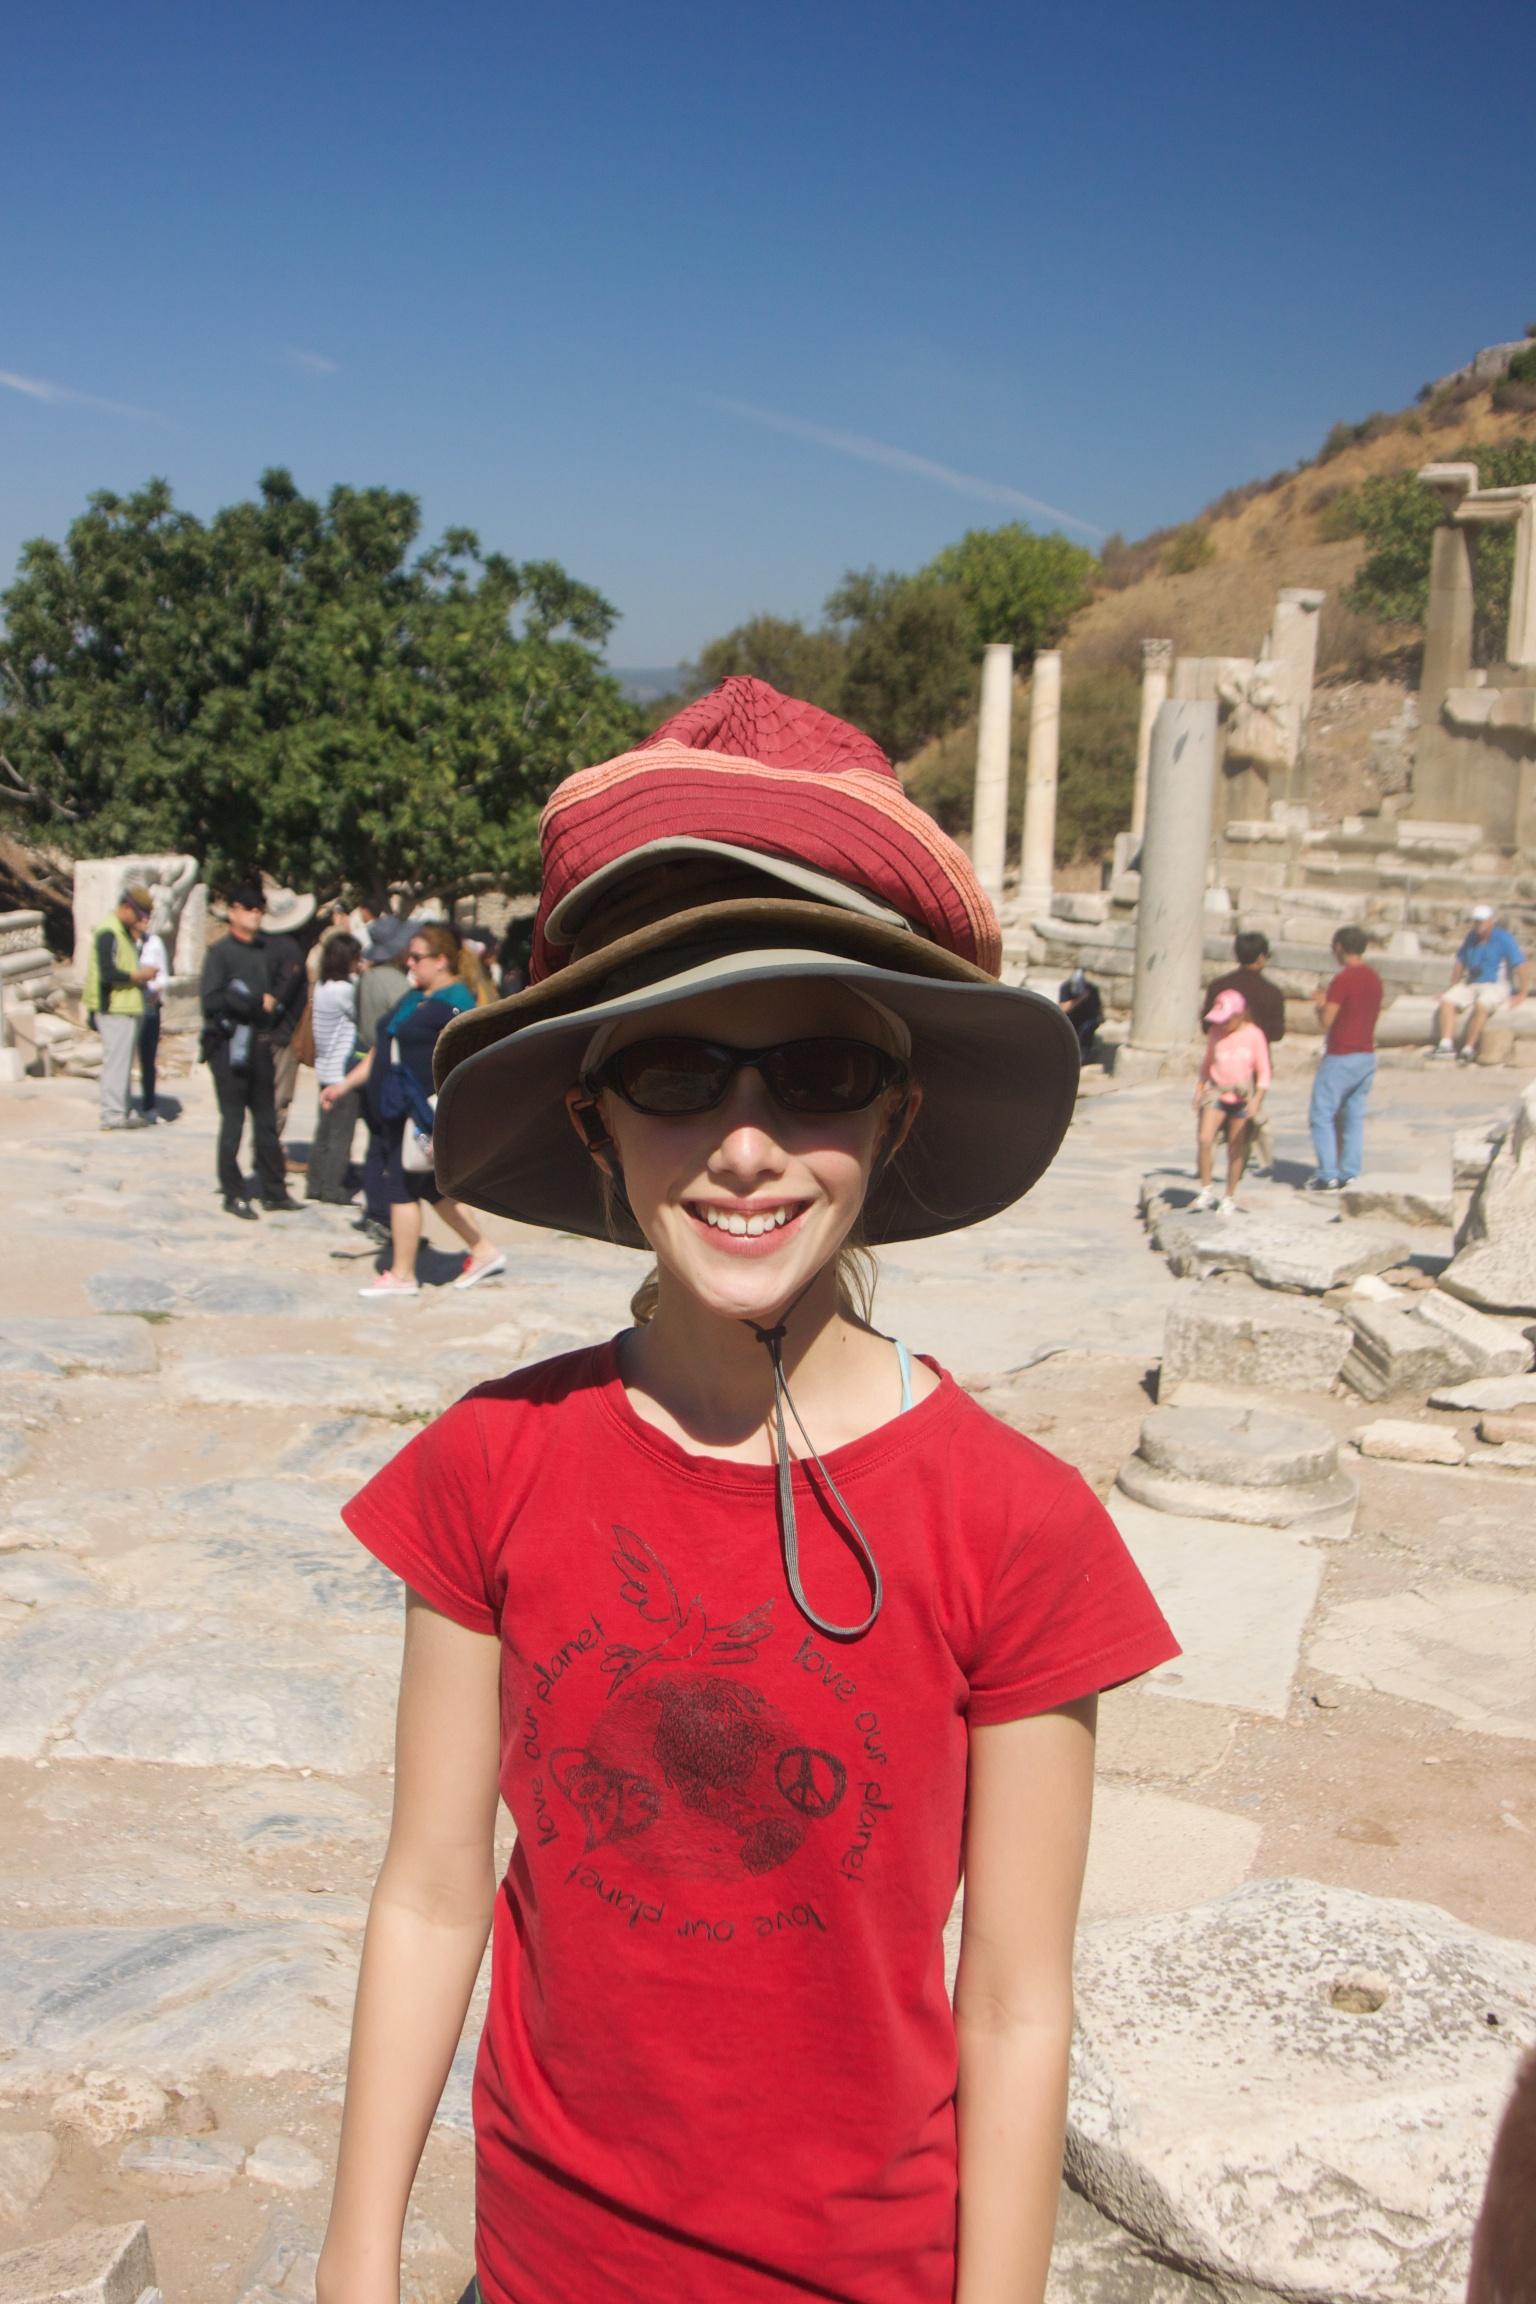 Zoe, Hat Acrobat